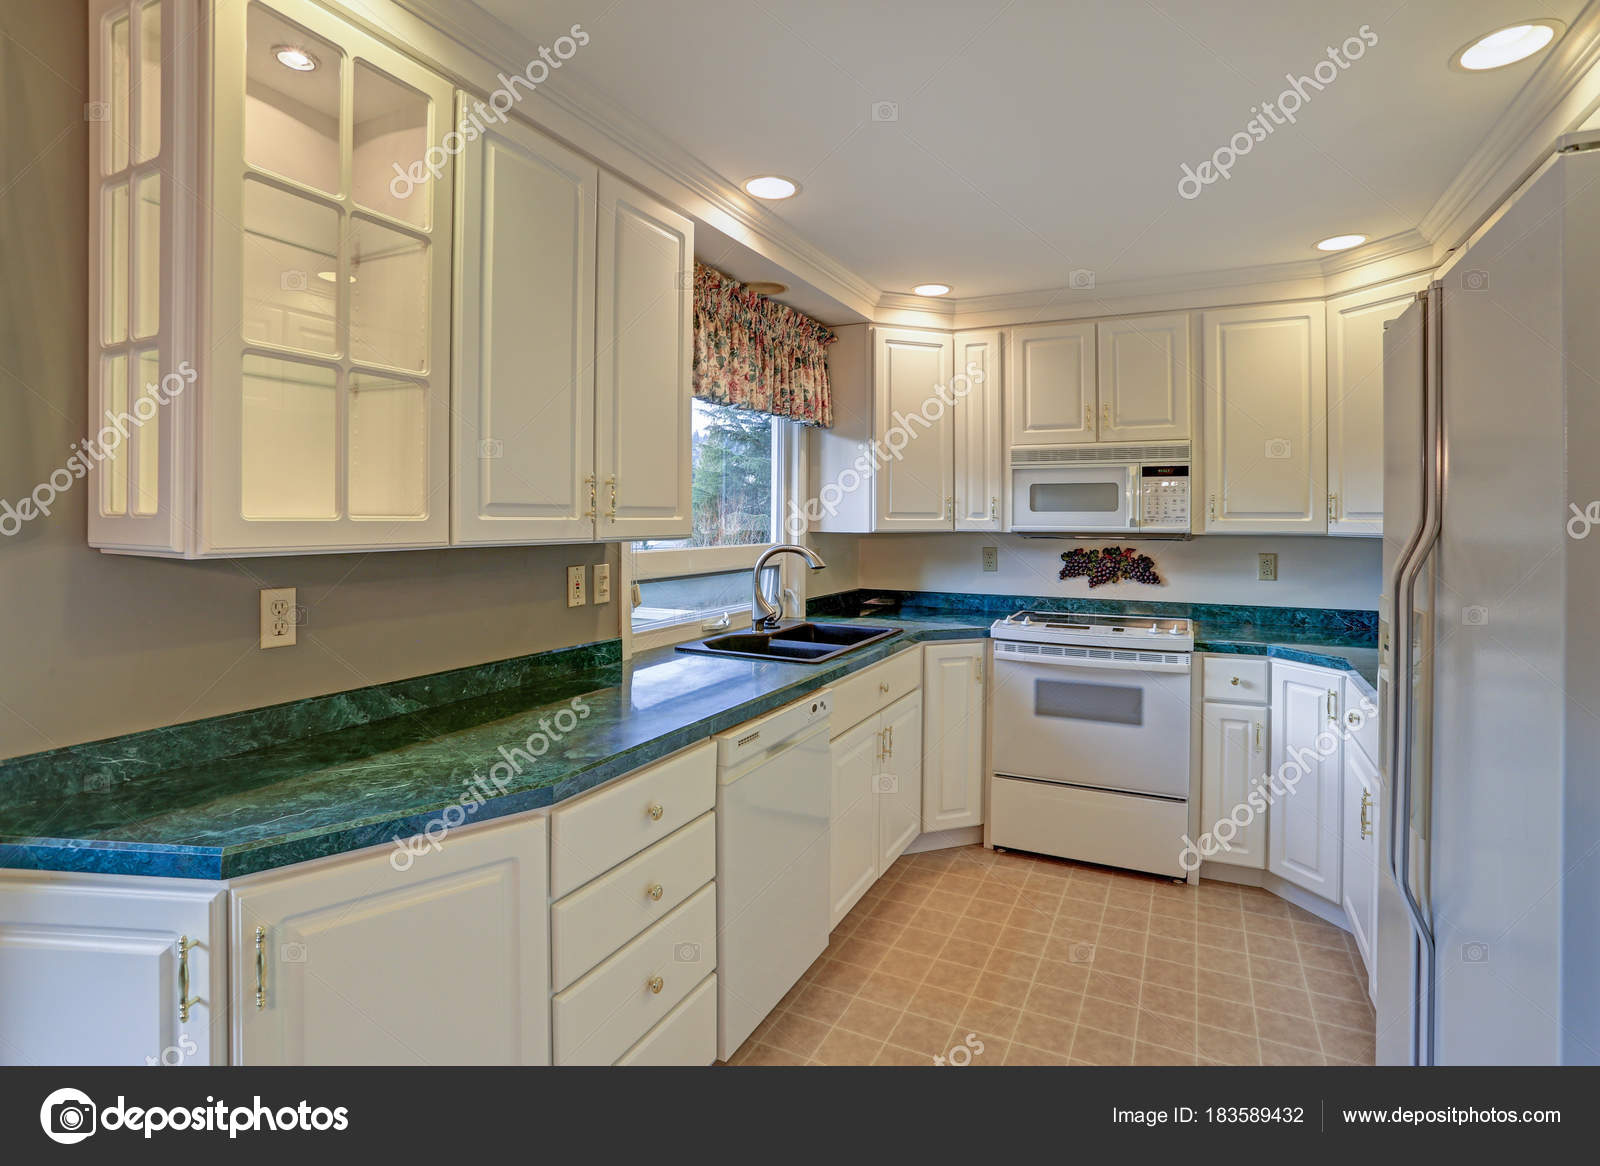 shaker style kitchen outdoor sets 配有白色橱柜的新装修厨房房 图库照片 c alabn 183589432 全新装修的厨房房 配备白色振动筛柜和绿色大理石台面 照片作者alabn